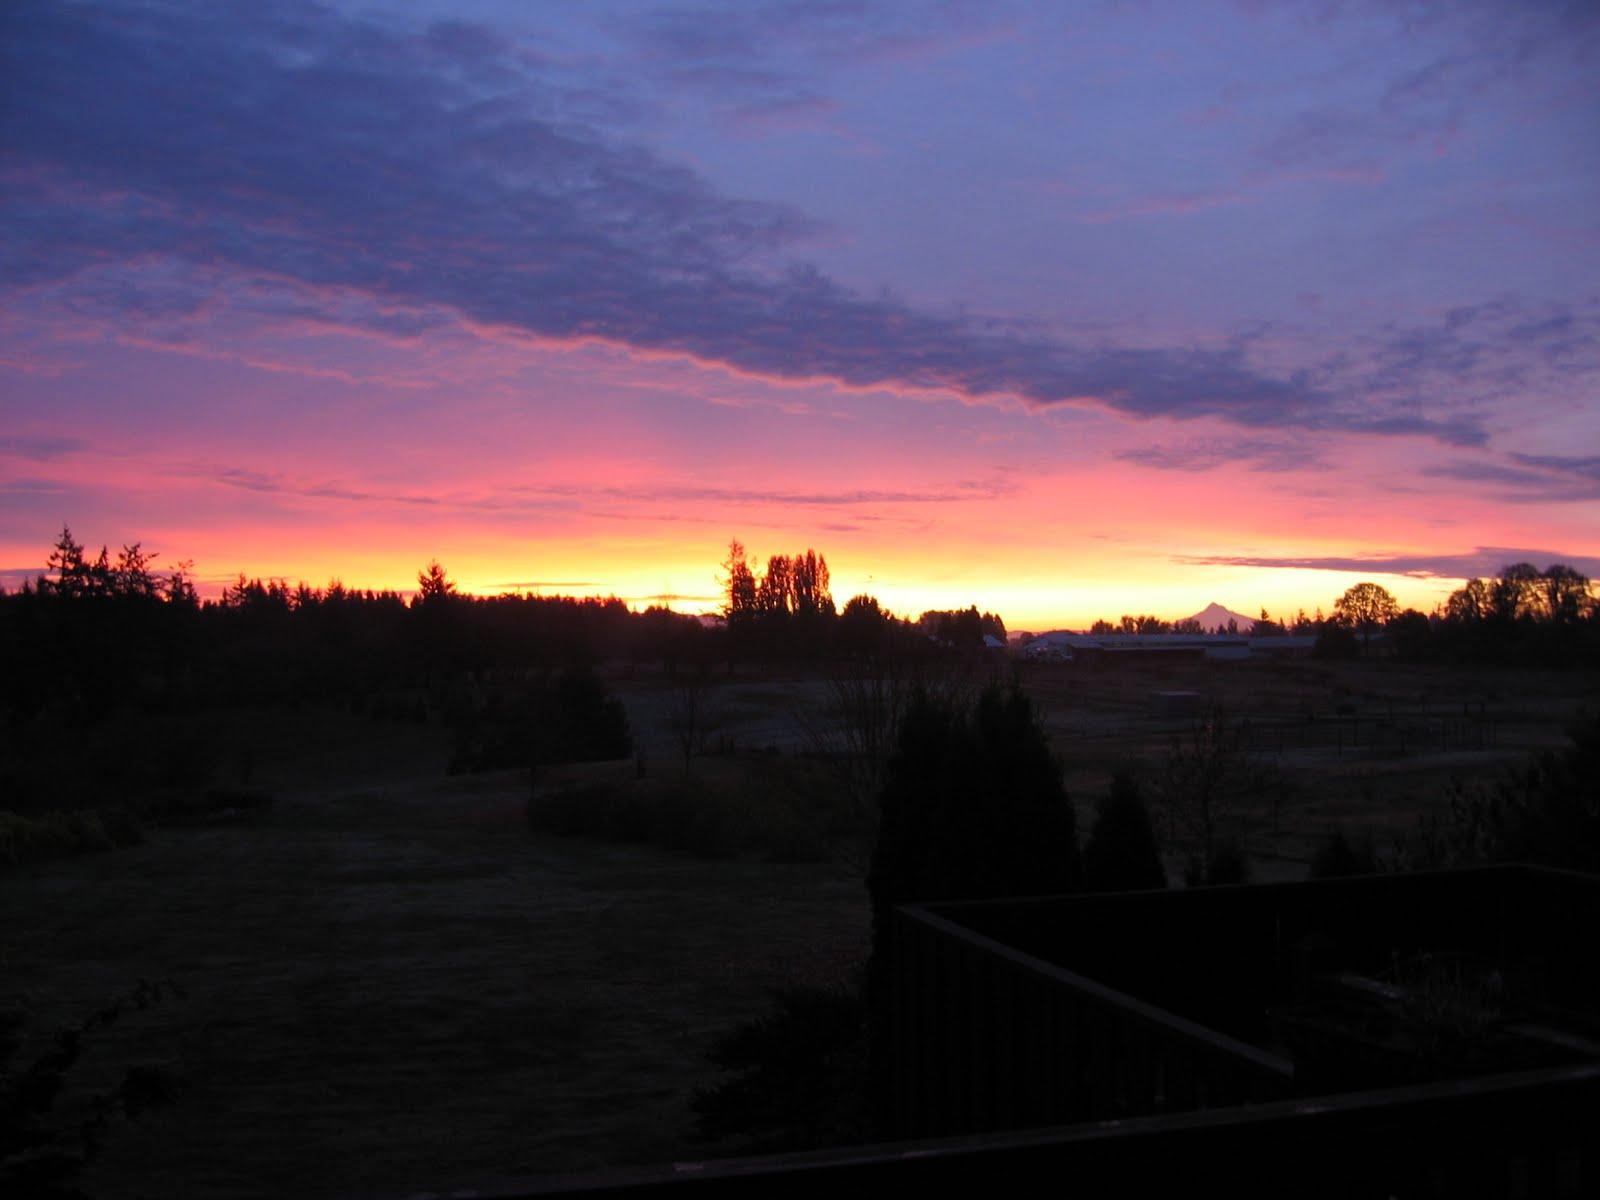 Sunrises and Sunsets